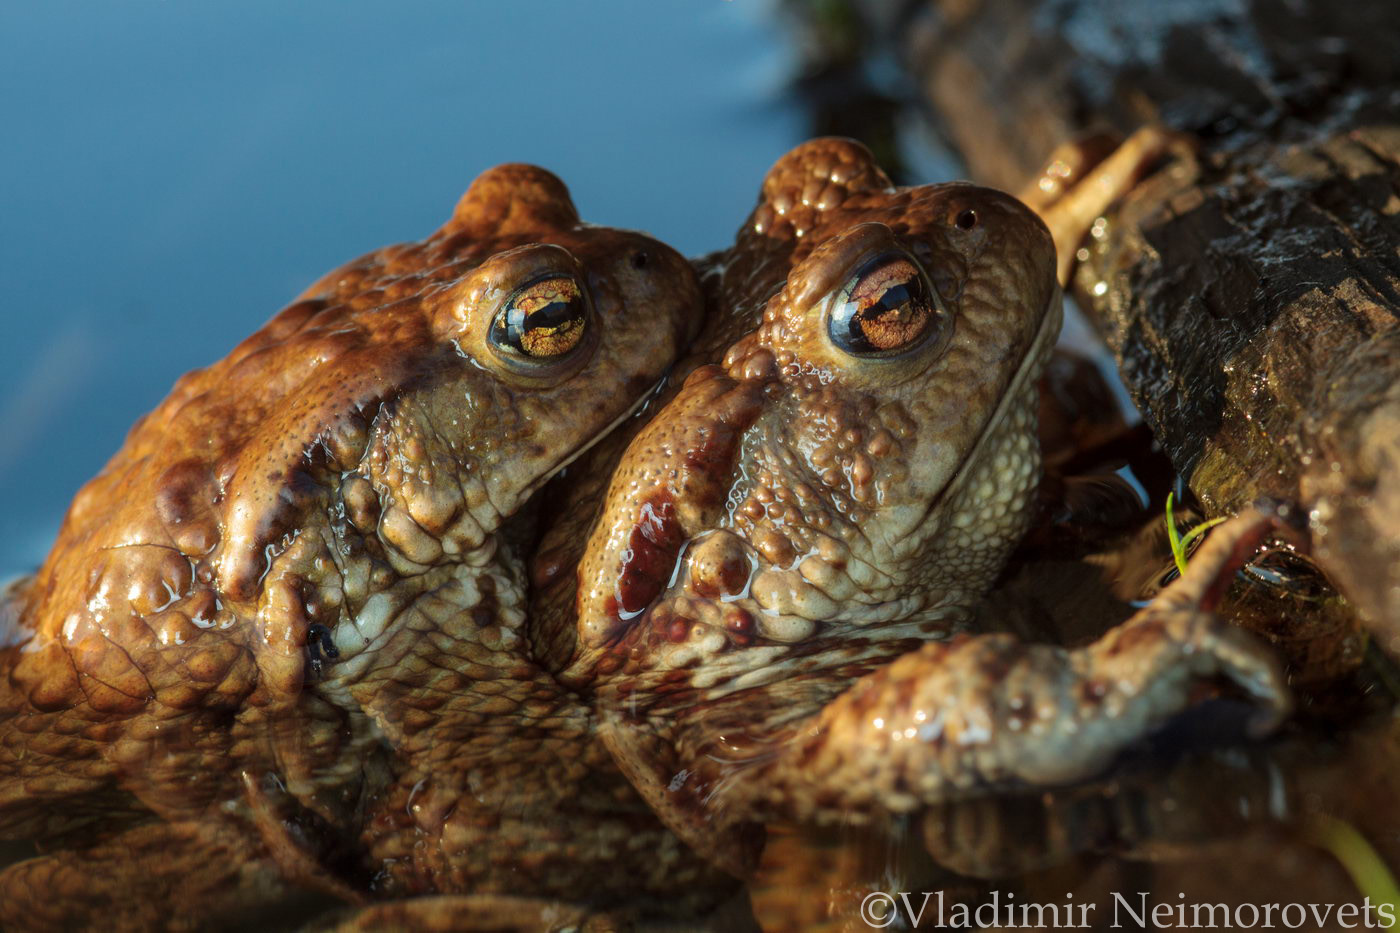 Bufo bufo_Leningrad region_common toad_European toad_toad